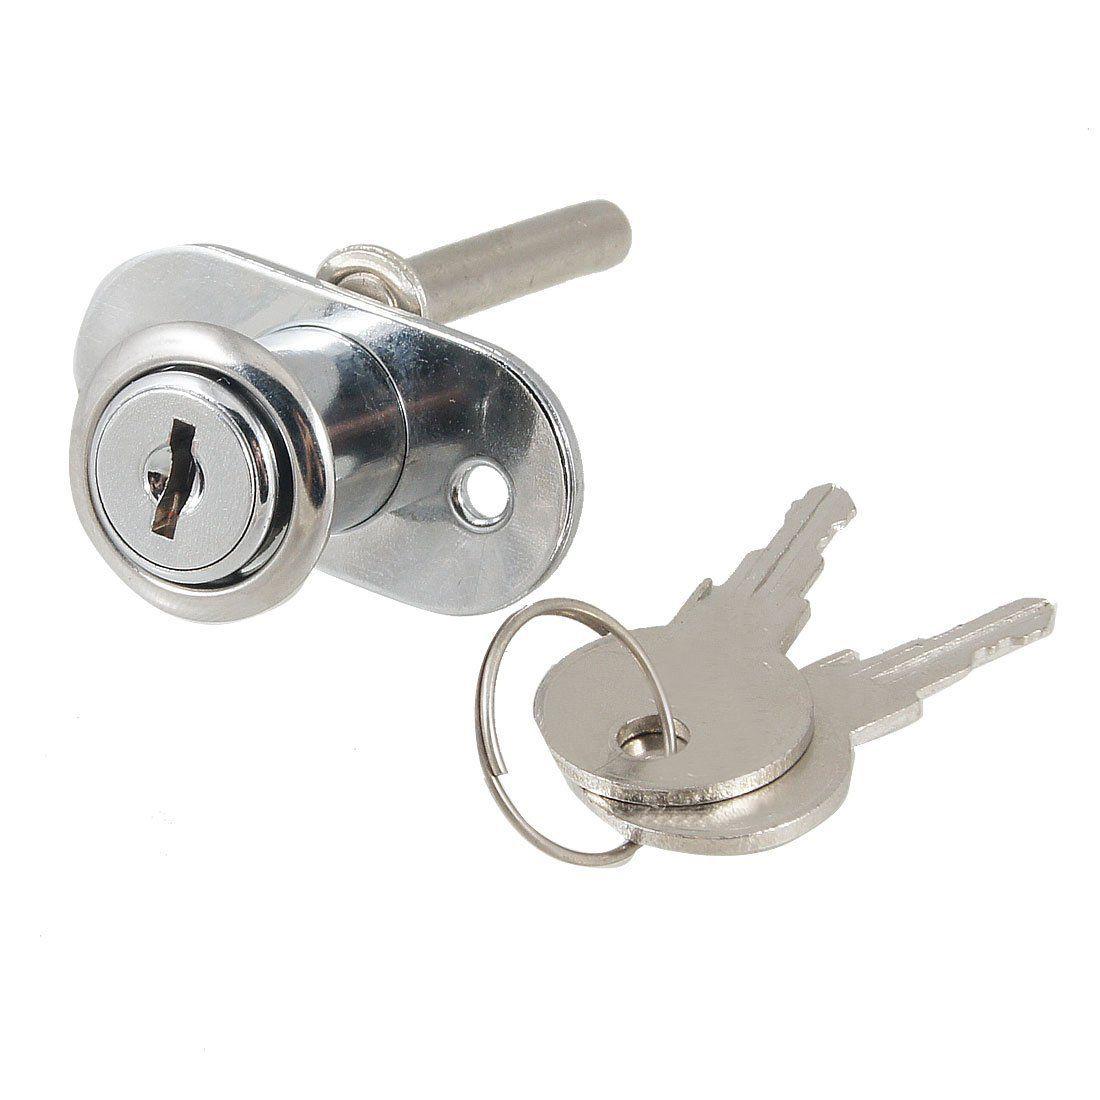 16mm Cylinder Head Diameter Silver Tone Sliding Door Plunger Lock W Keys Plunger Sliding Doors Silver Tone